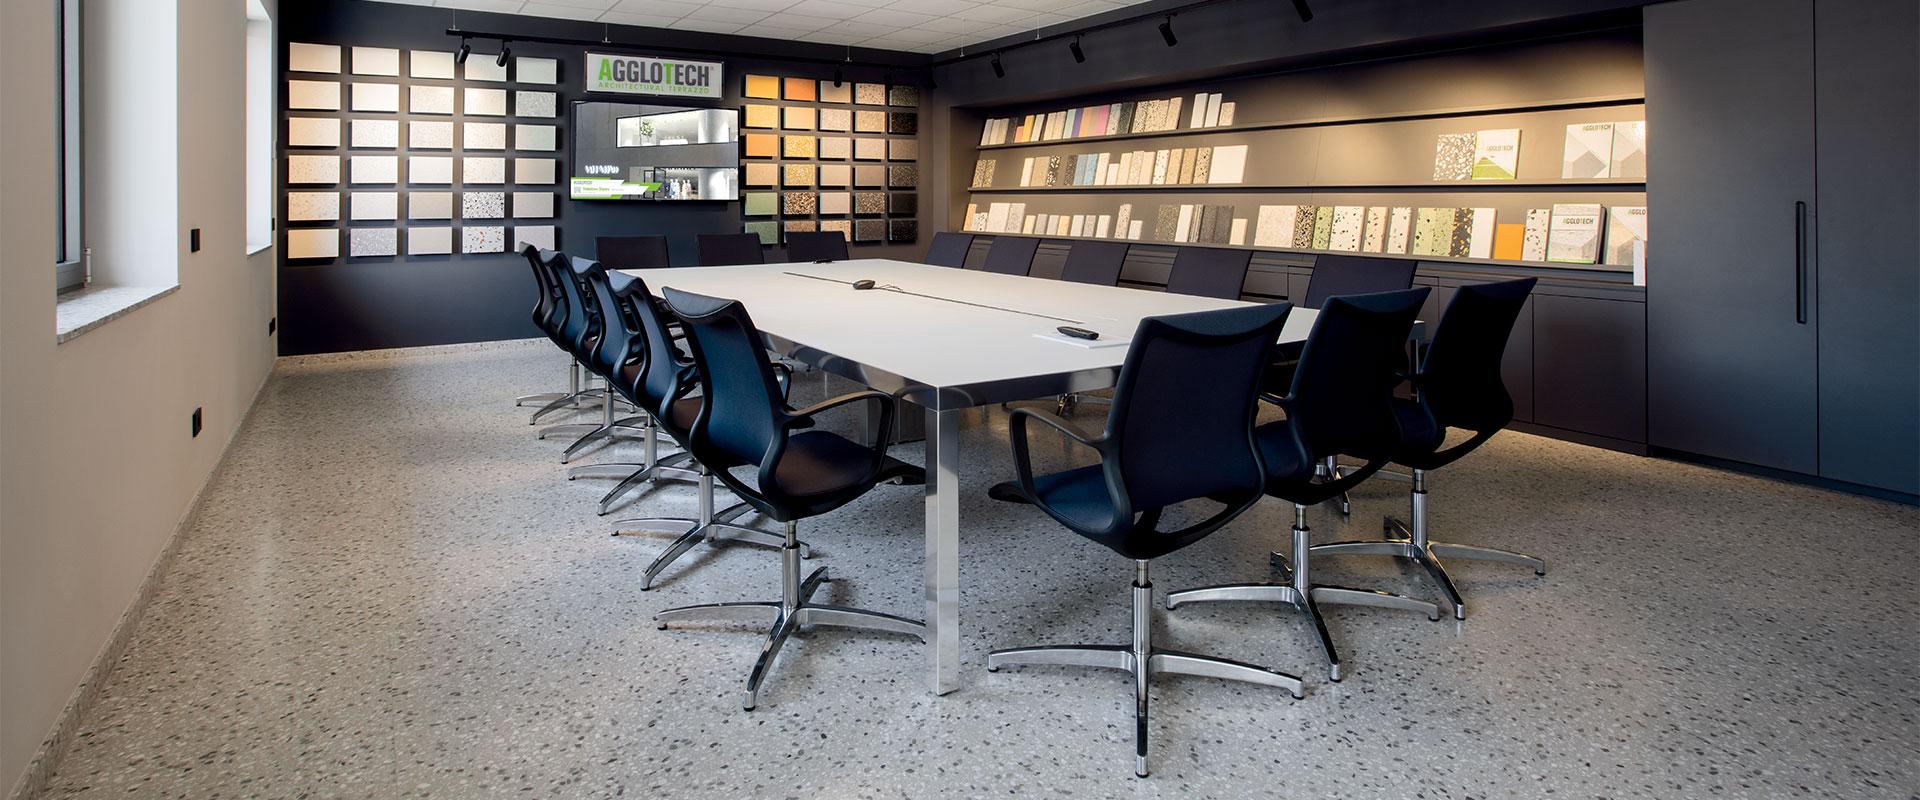 agglotech-offices---verona-italy---custom-REG-3594---centri-direzionali-03---OK